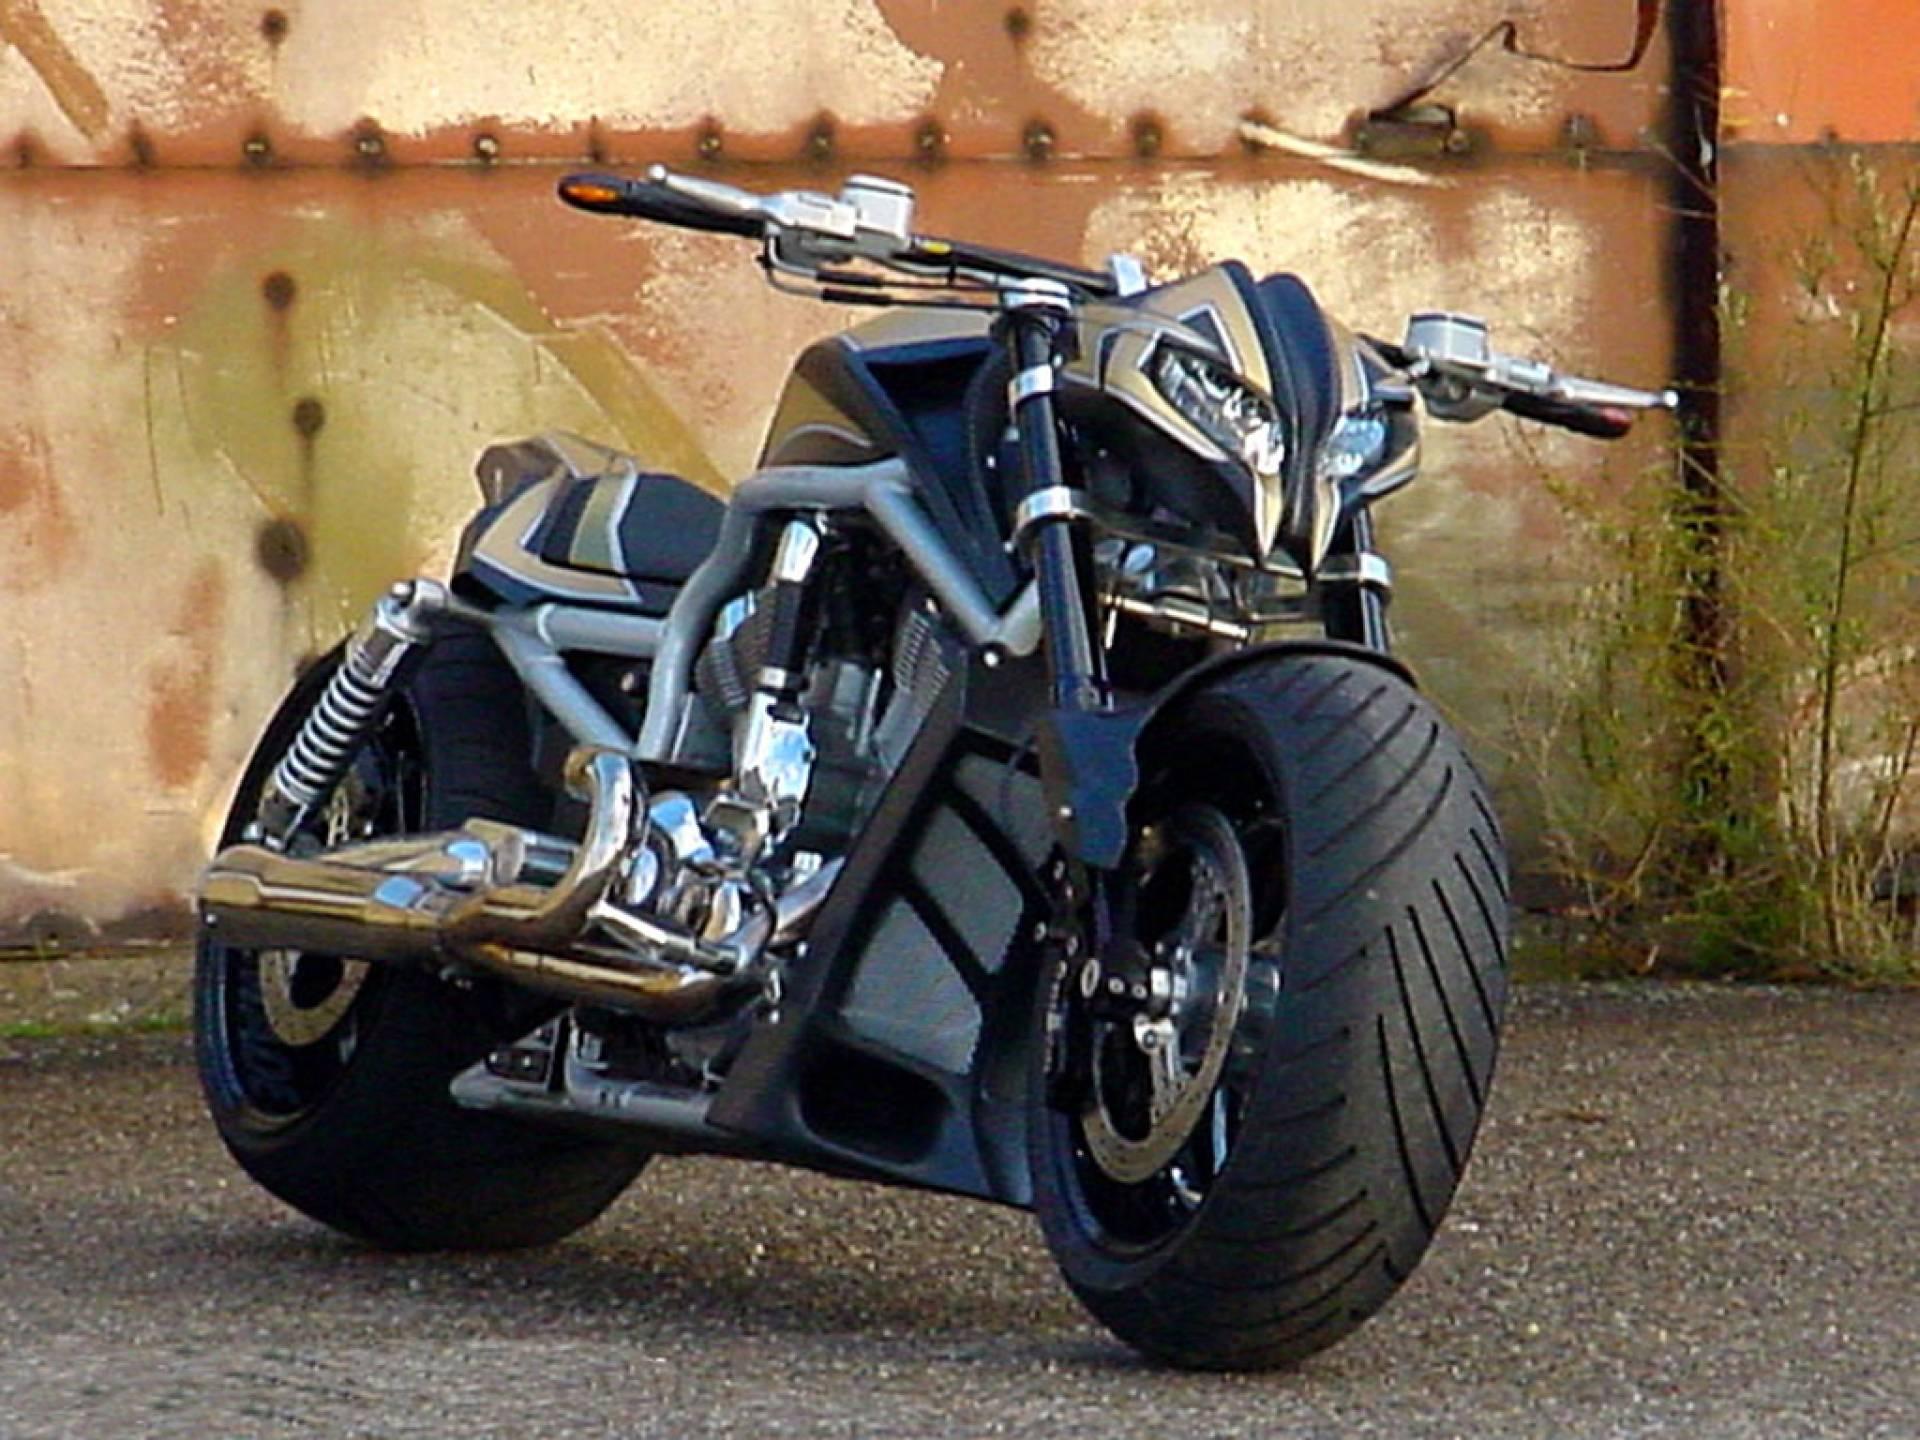 Harley Davidson Hd Wallpapers Top Free Harley Davidson Hd